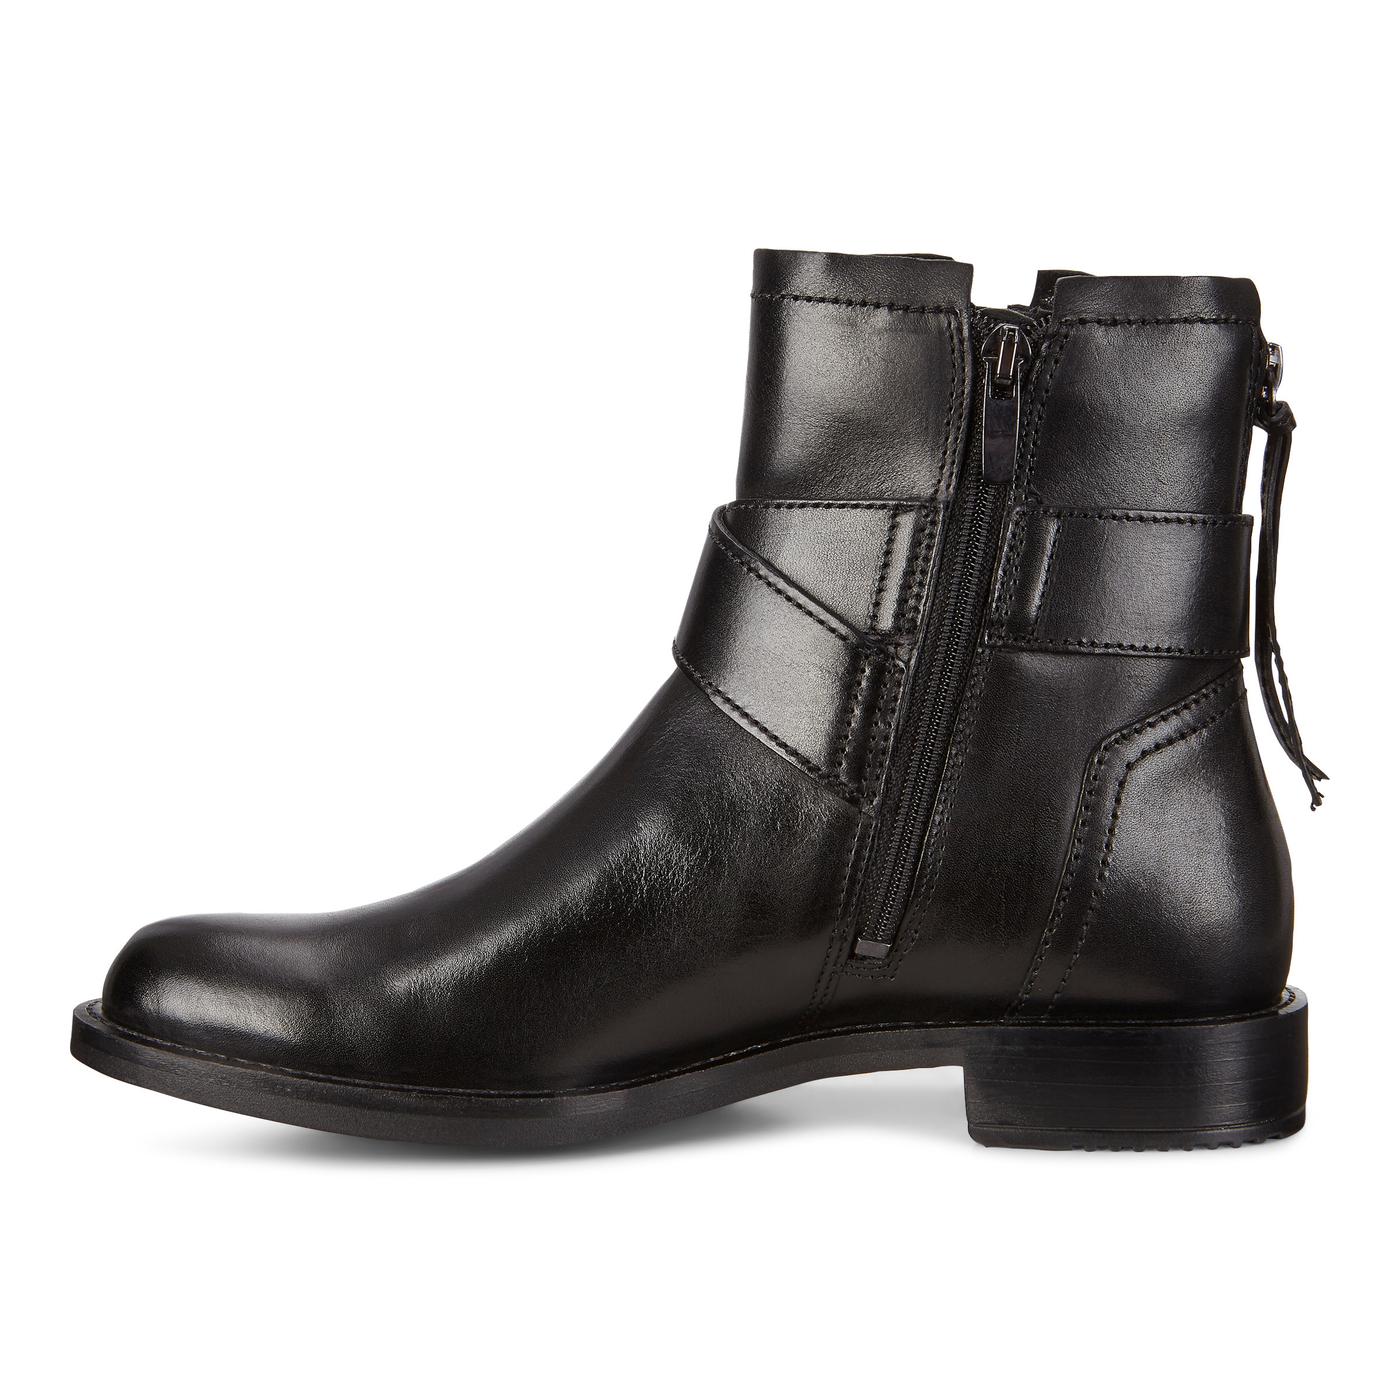 ECCO Sartorelle 25 Buckle Boot